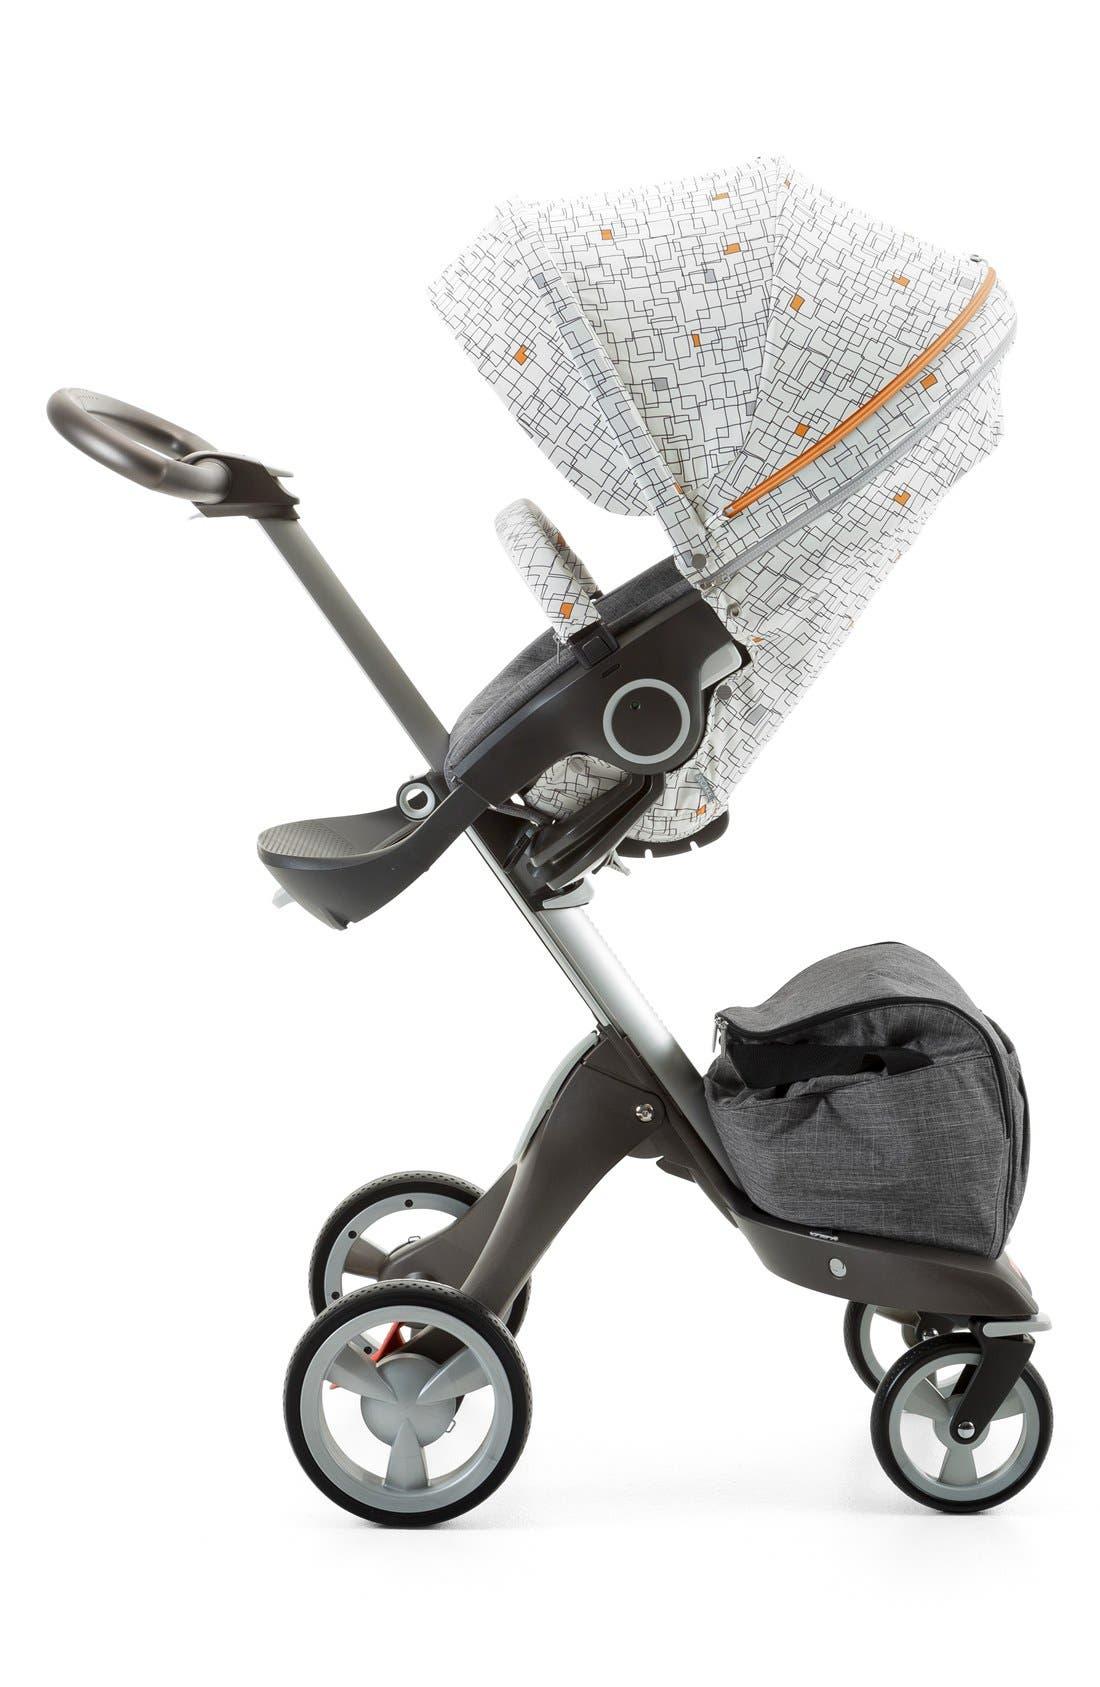 Stokke 'Grid' Stroller Seat Style Kit